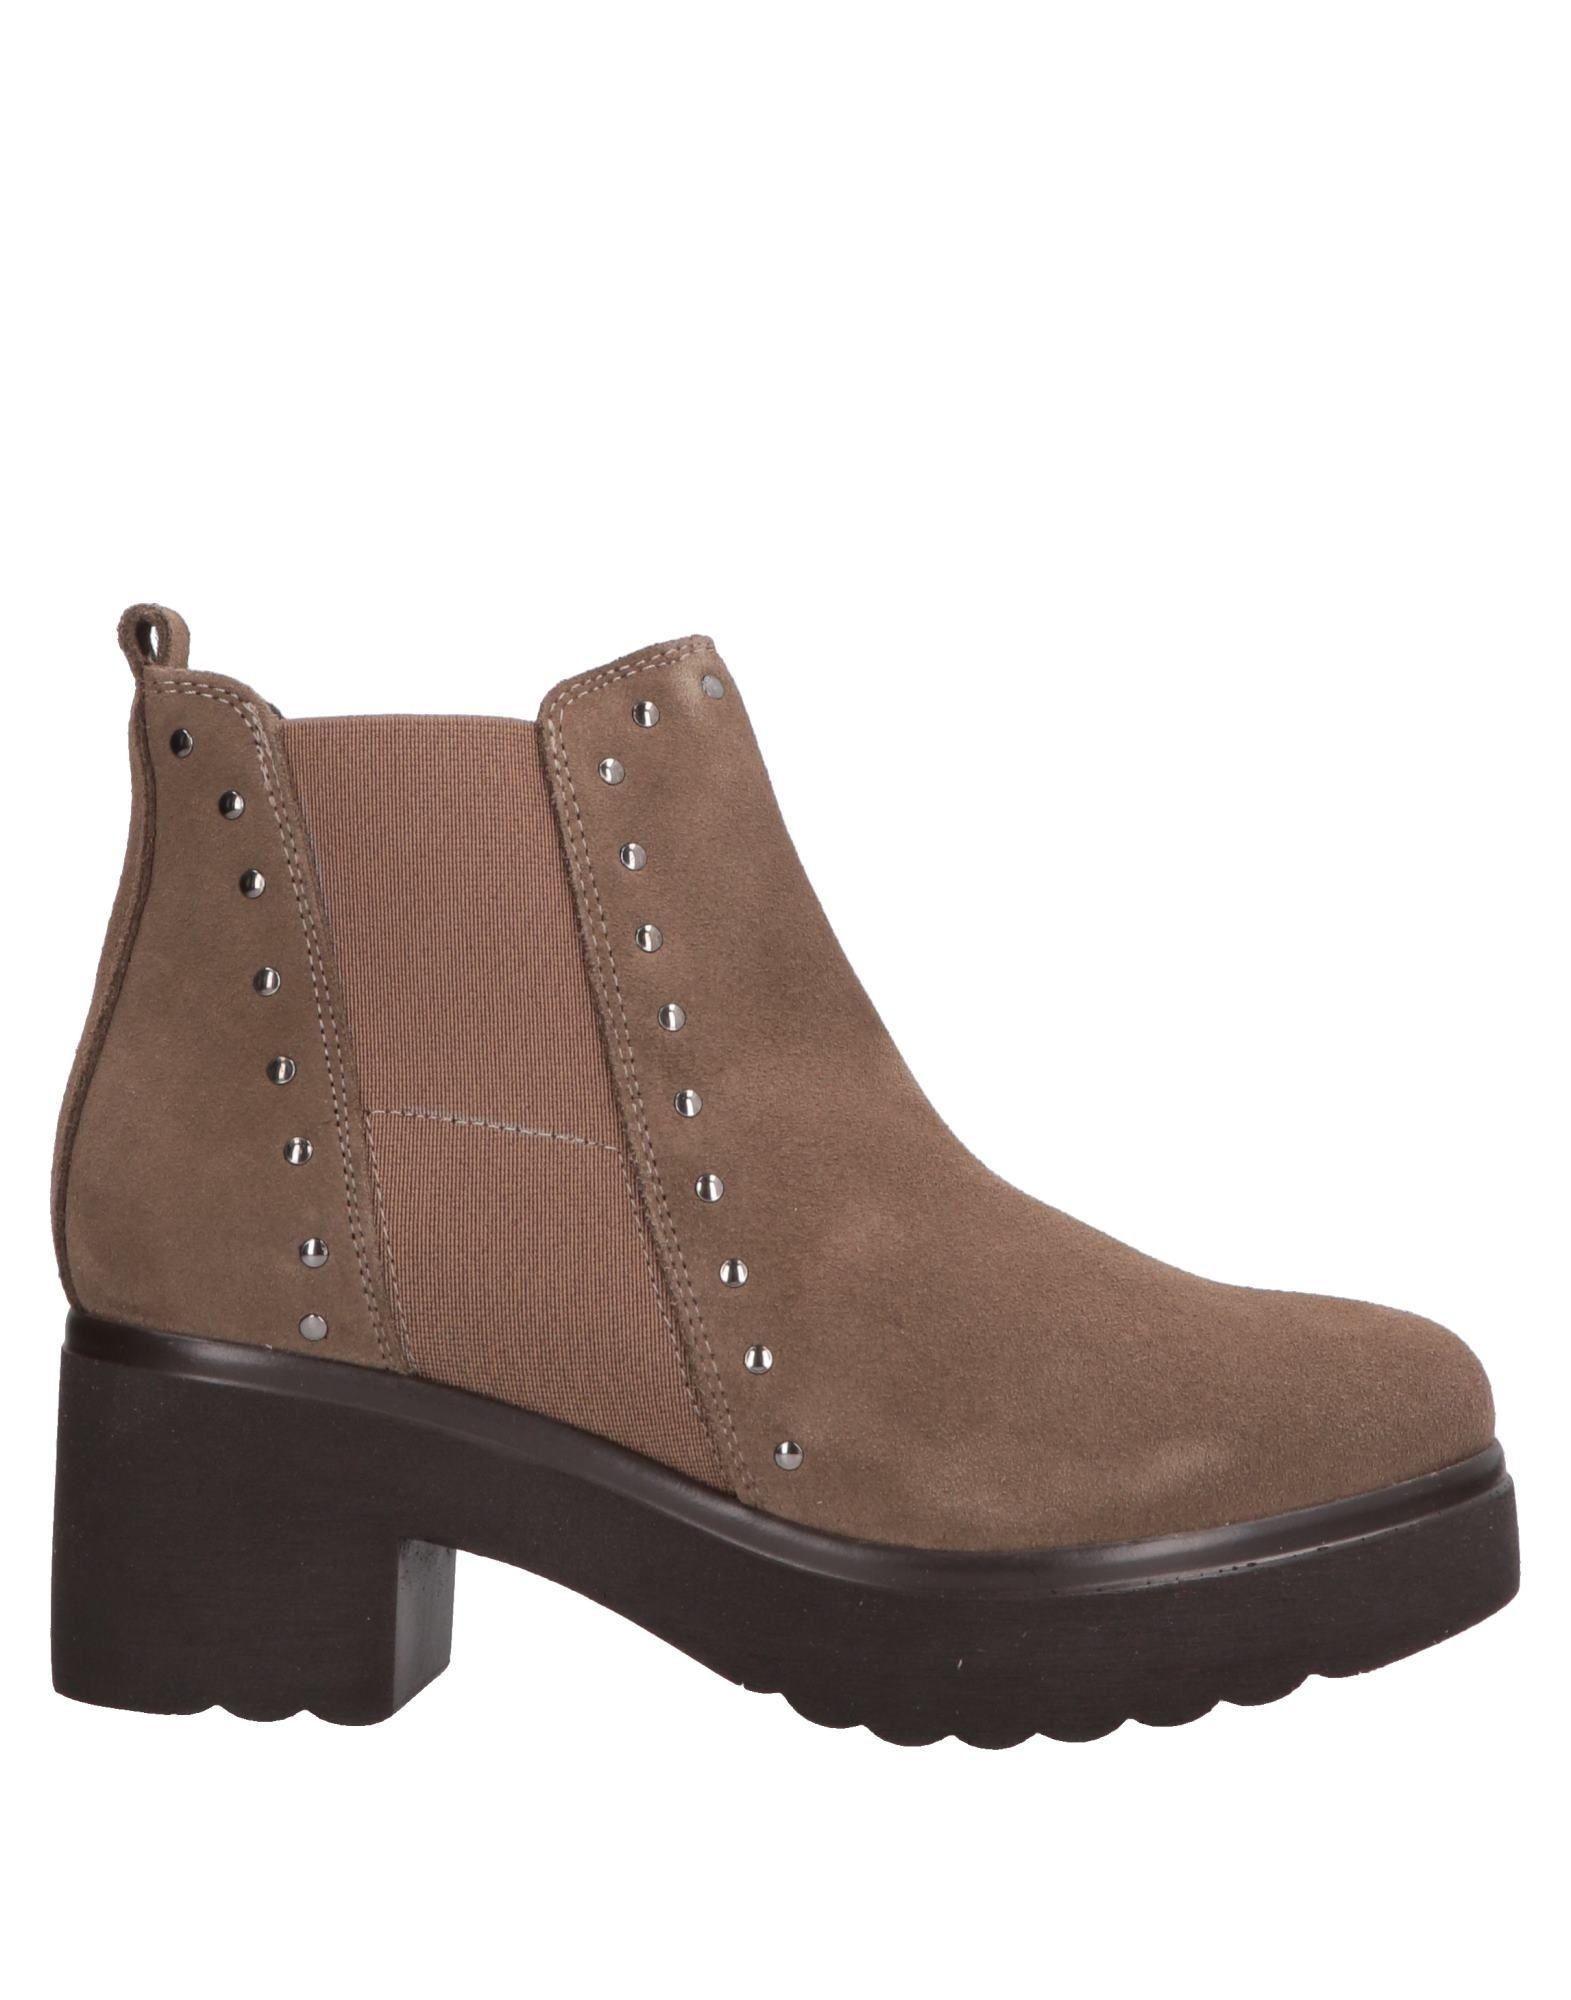 Claudia By Isaberi Chelsea Boots Damen  11568808KE Gute Qualität beliebte Schuhe